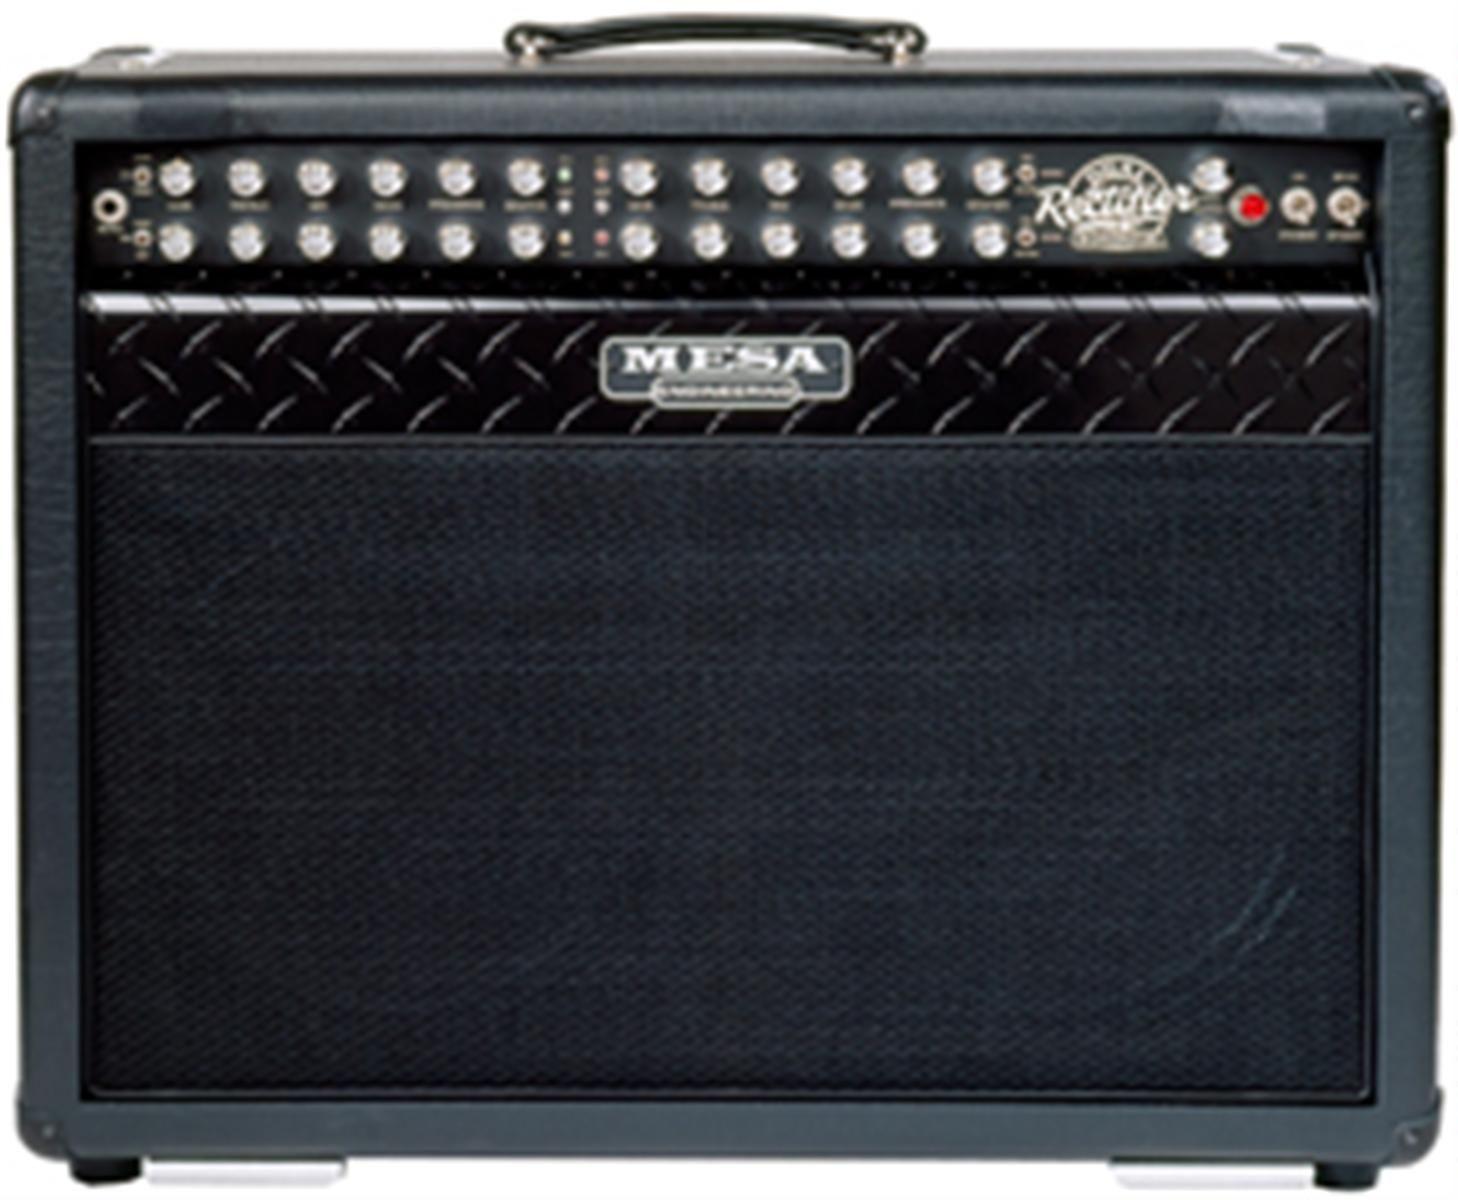 mesa boogie dual rectifier 2x12 roadster combo guitar amplifier dream amp loud versatile. Black Bedroom Furniture Sets. Home Design Ideas